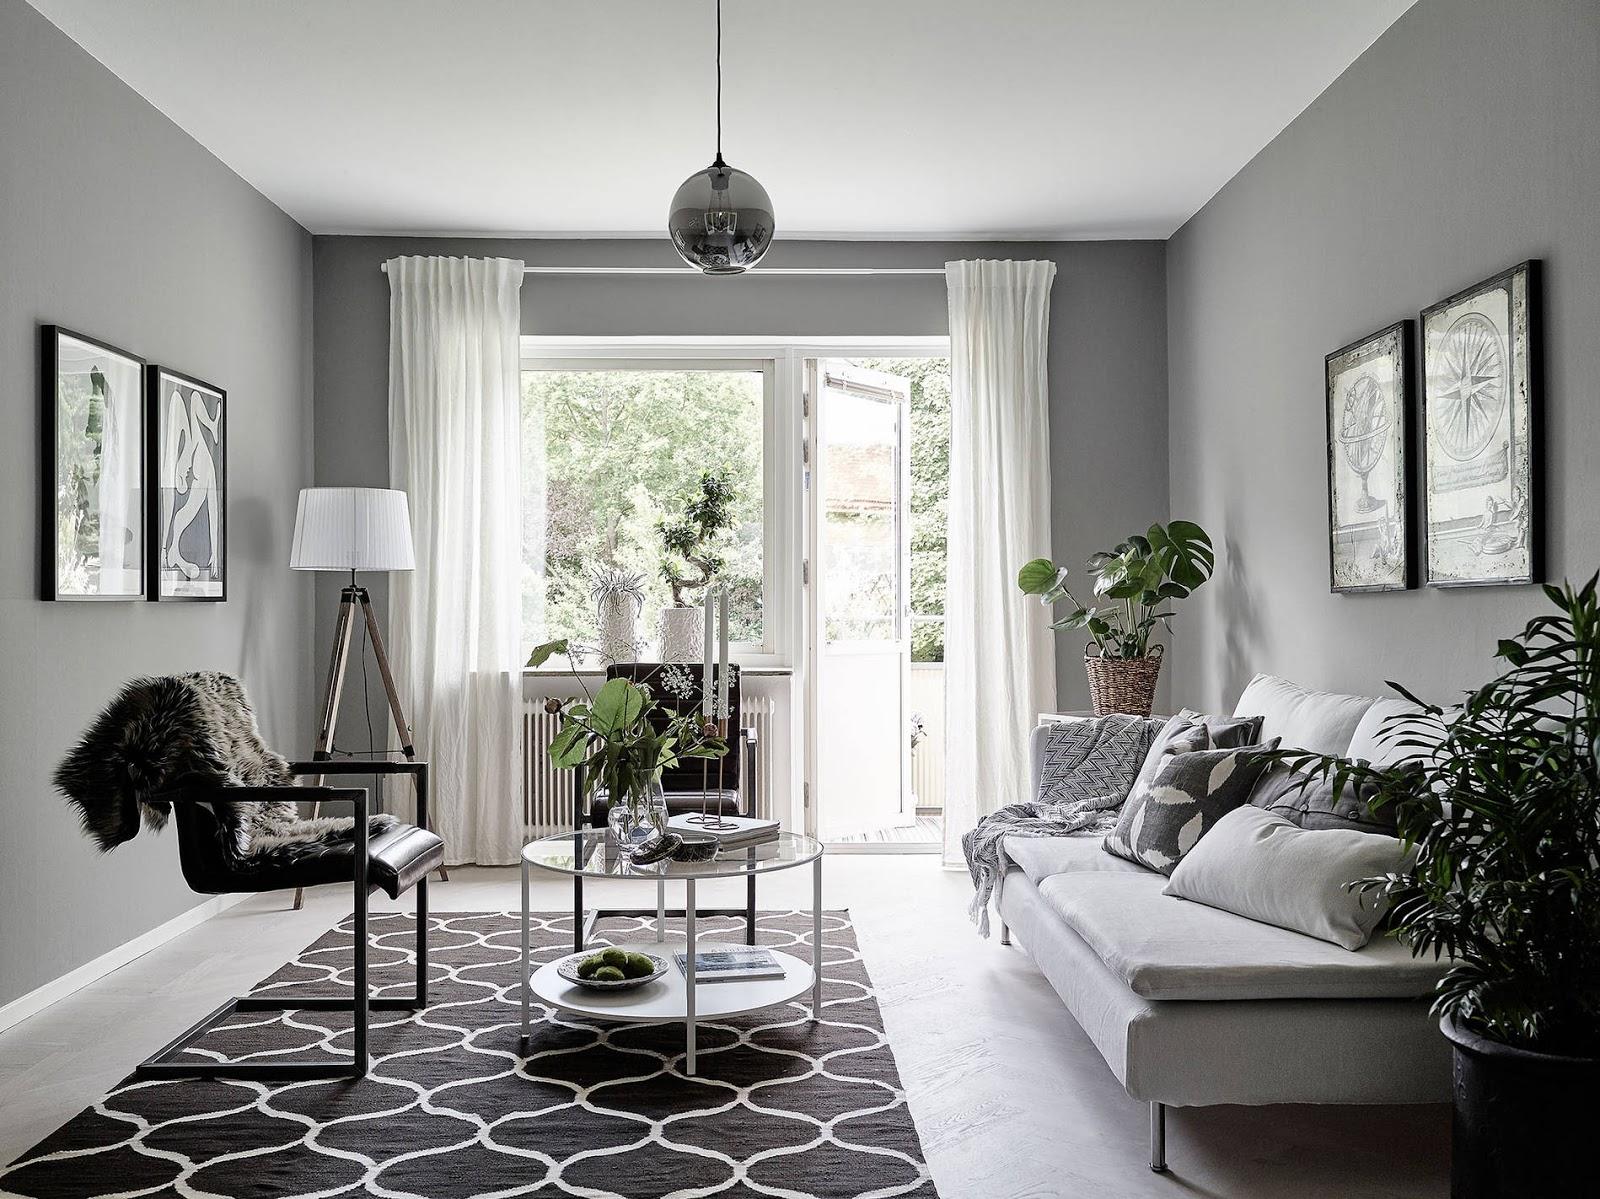 dywan IKEA, dywan w stylu skandynawskim